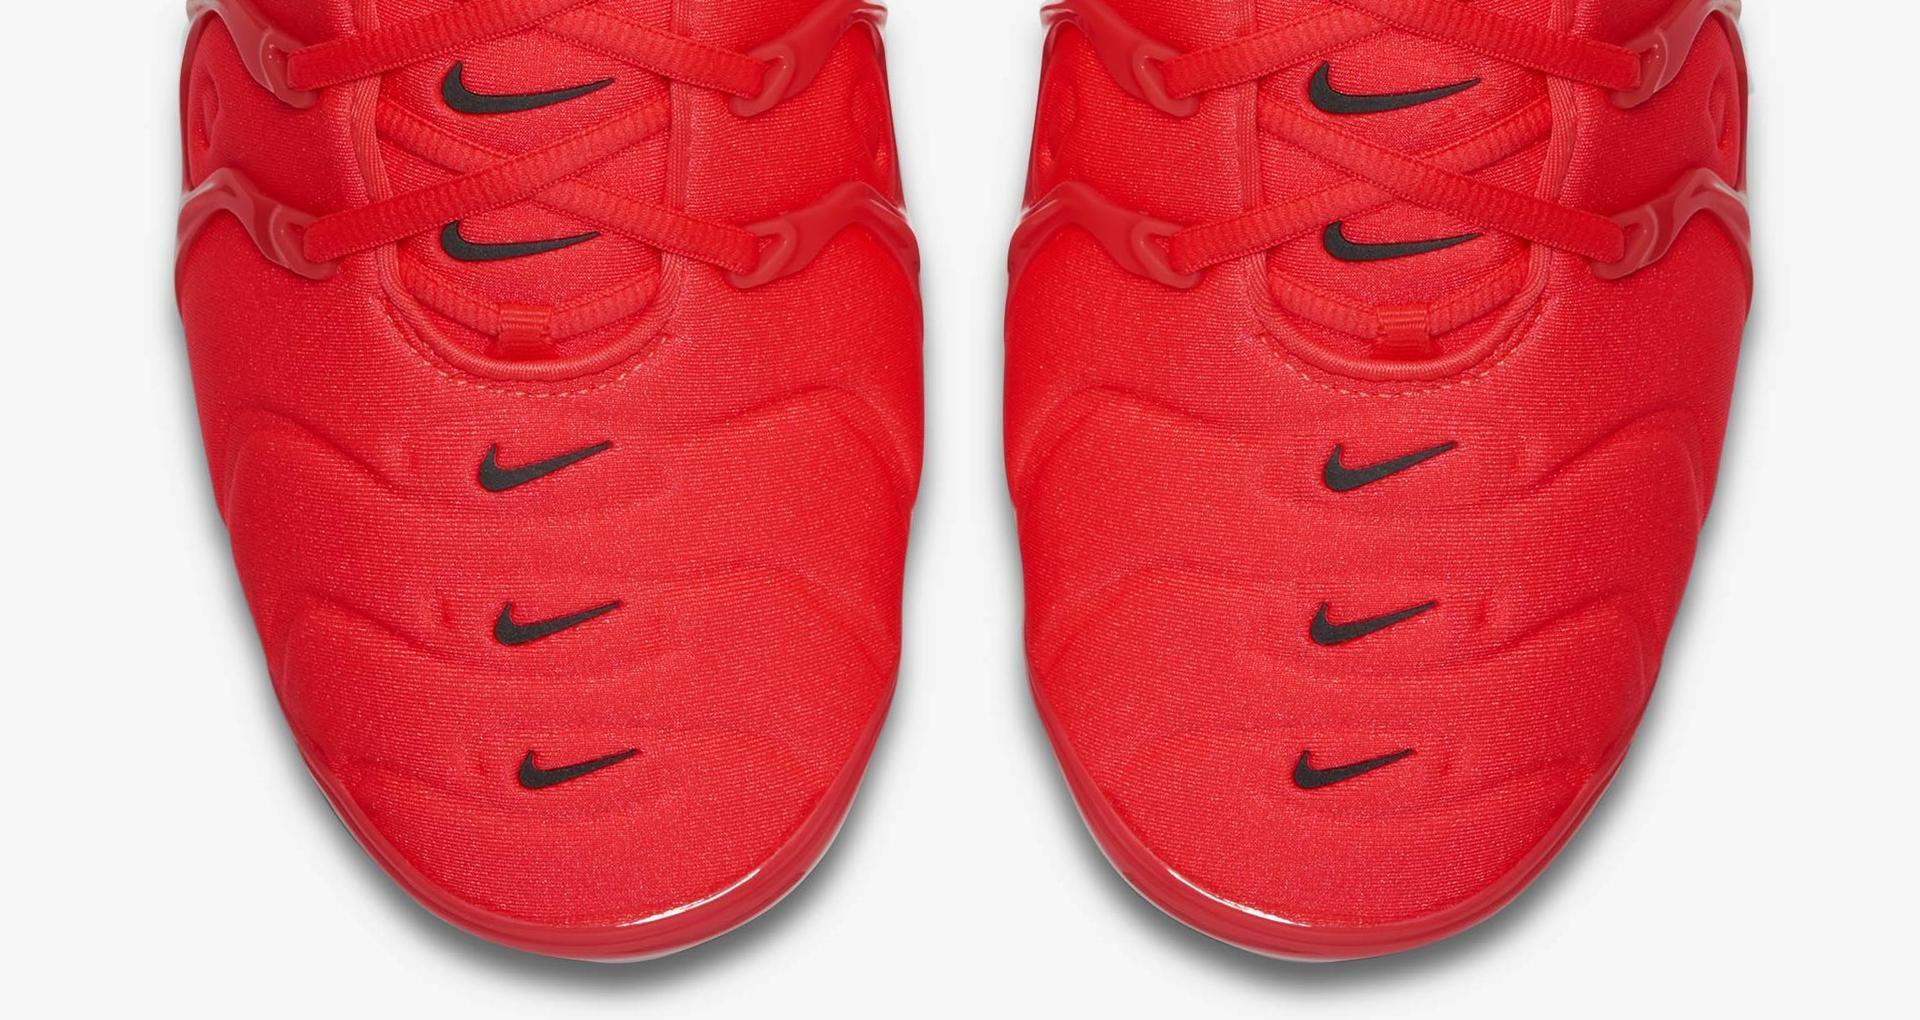 wholesale dealer bc8b2 31226 Nike Air Vapormax Plus 'Bright Crimson & White & Black ...